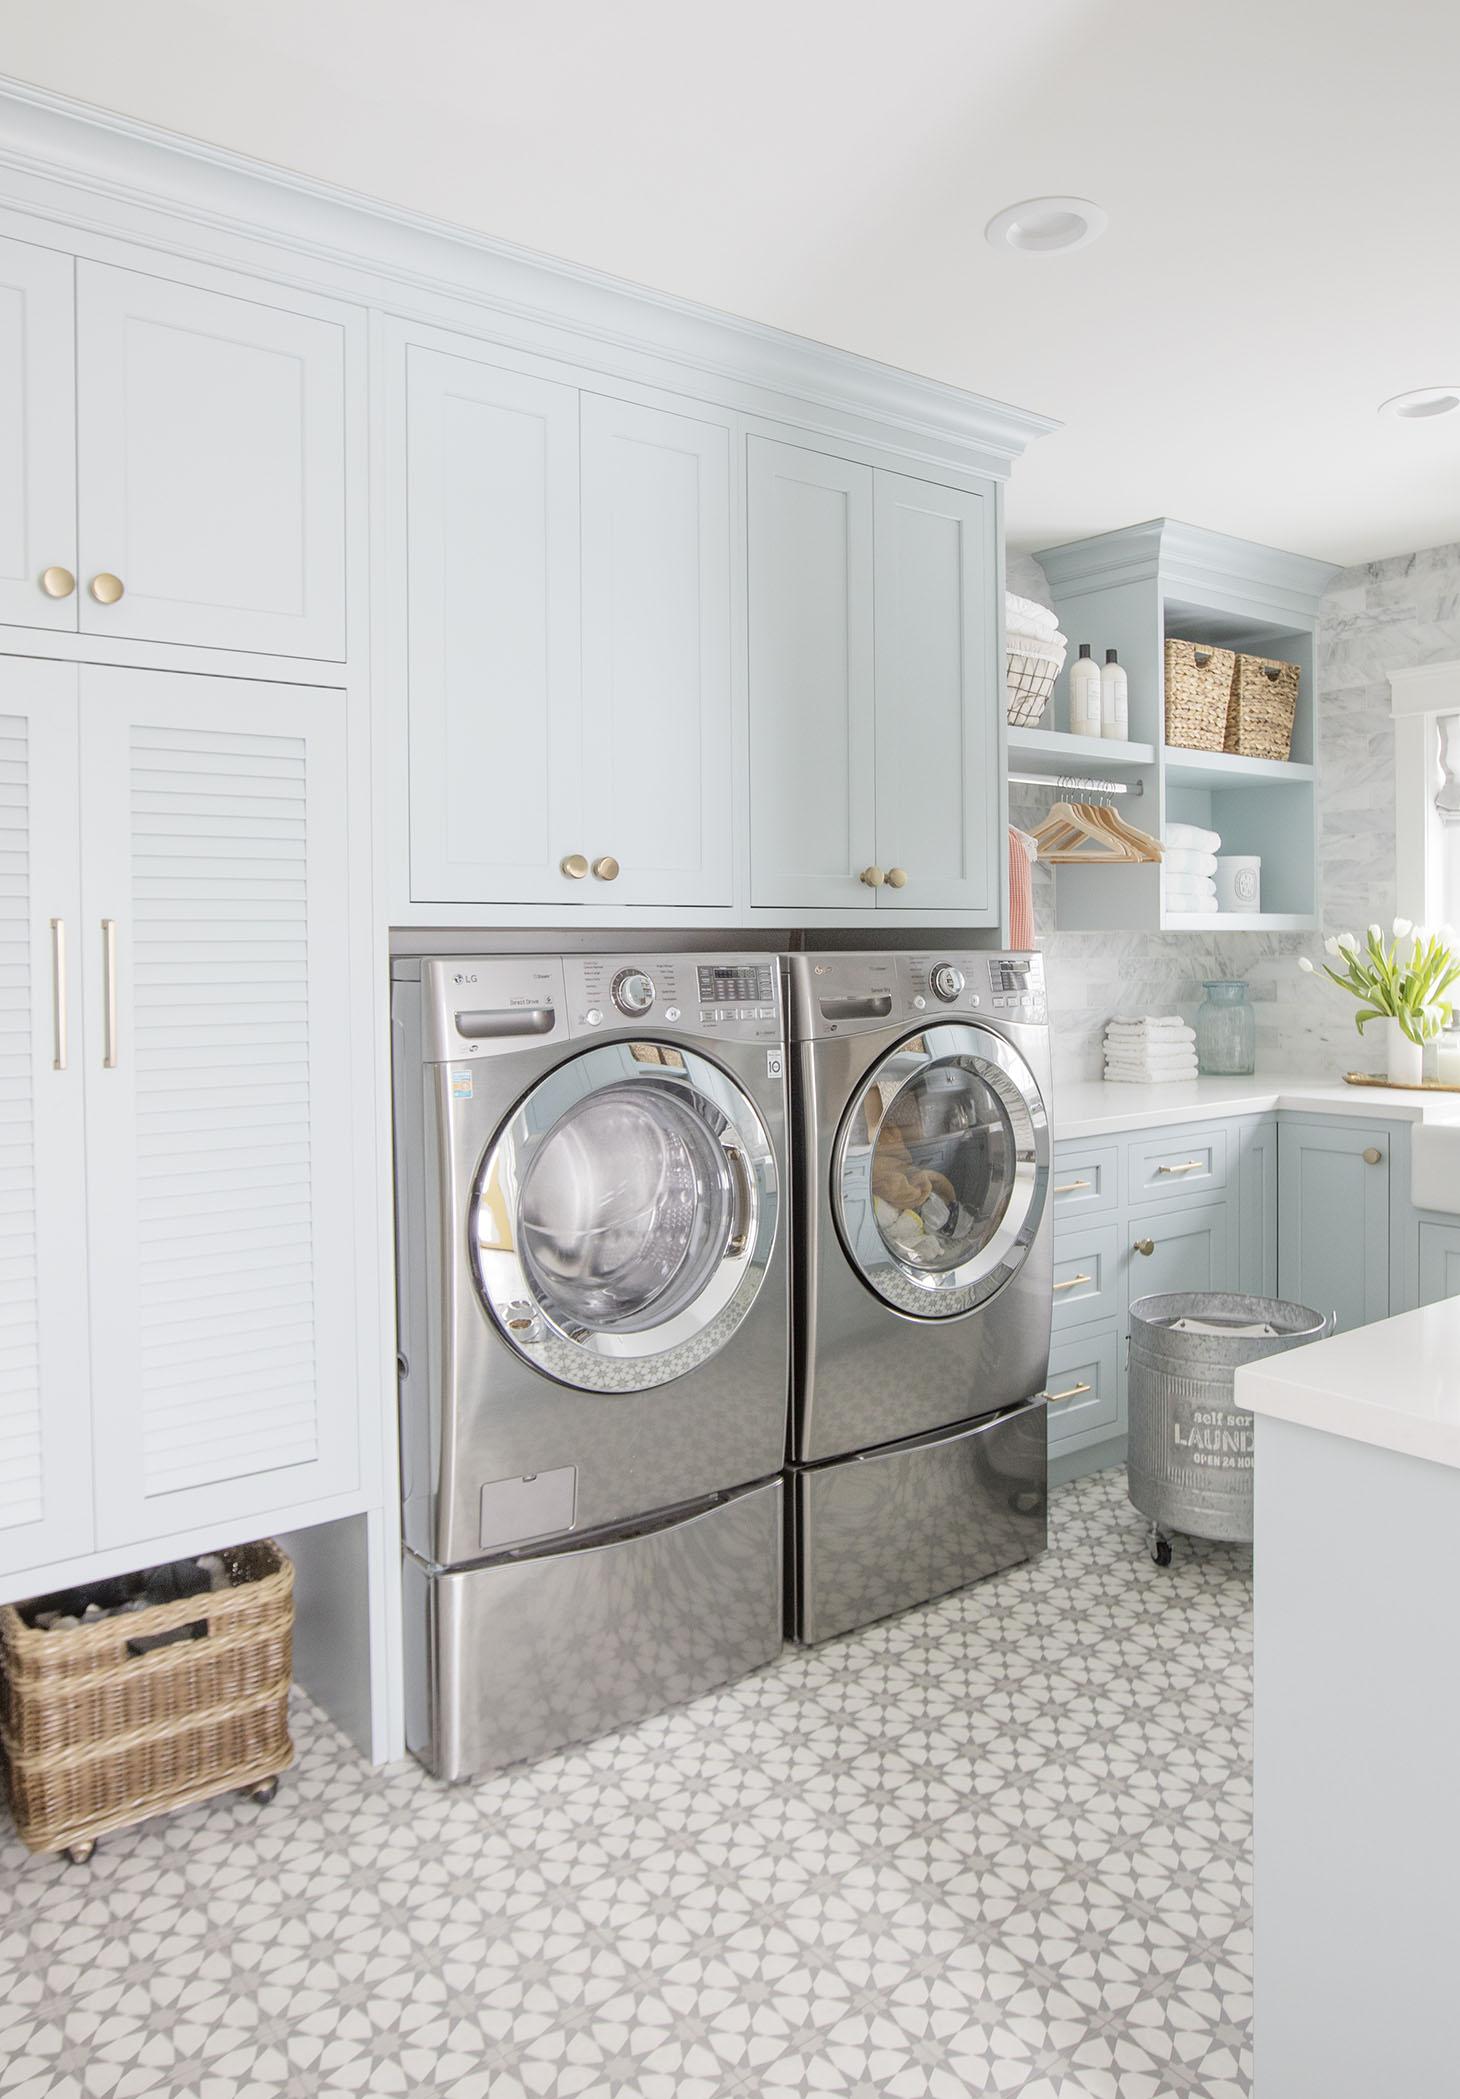 Jillian-Harris-Home-Tour-Series-Laundry-Room-20.jpg